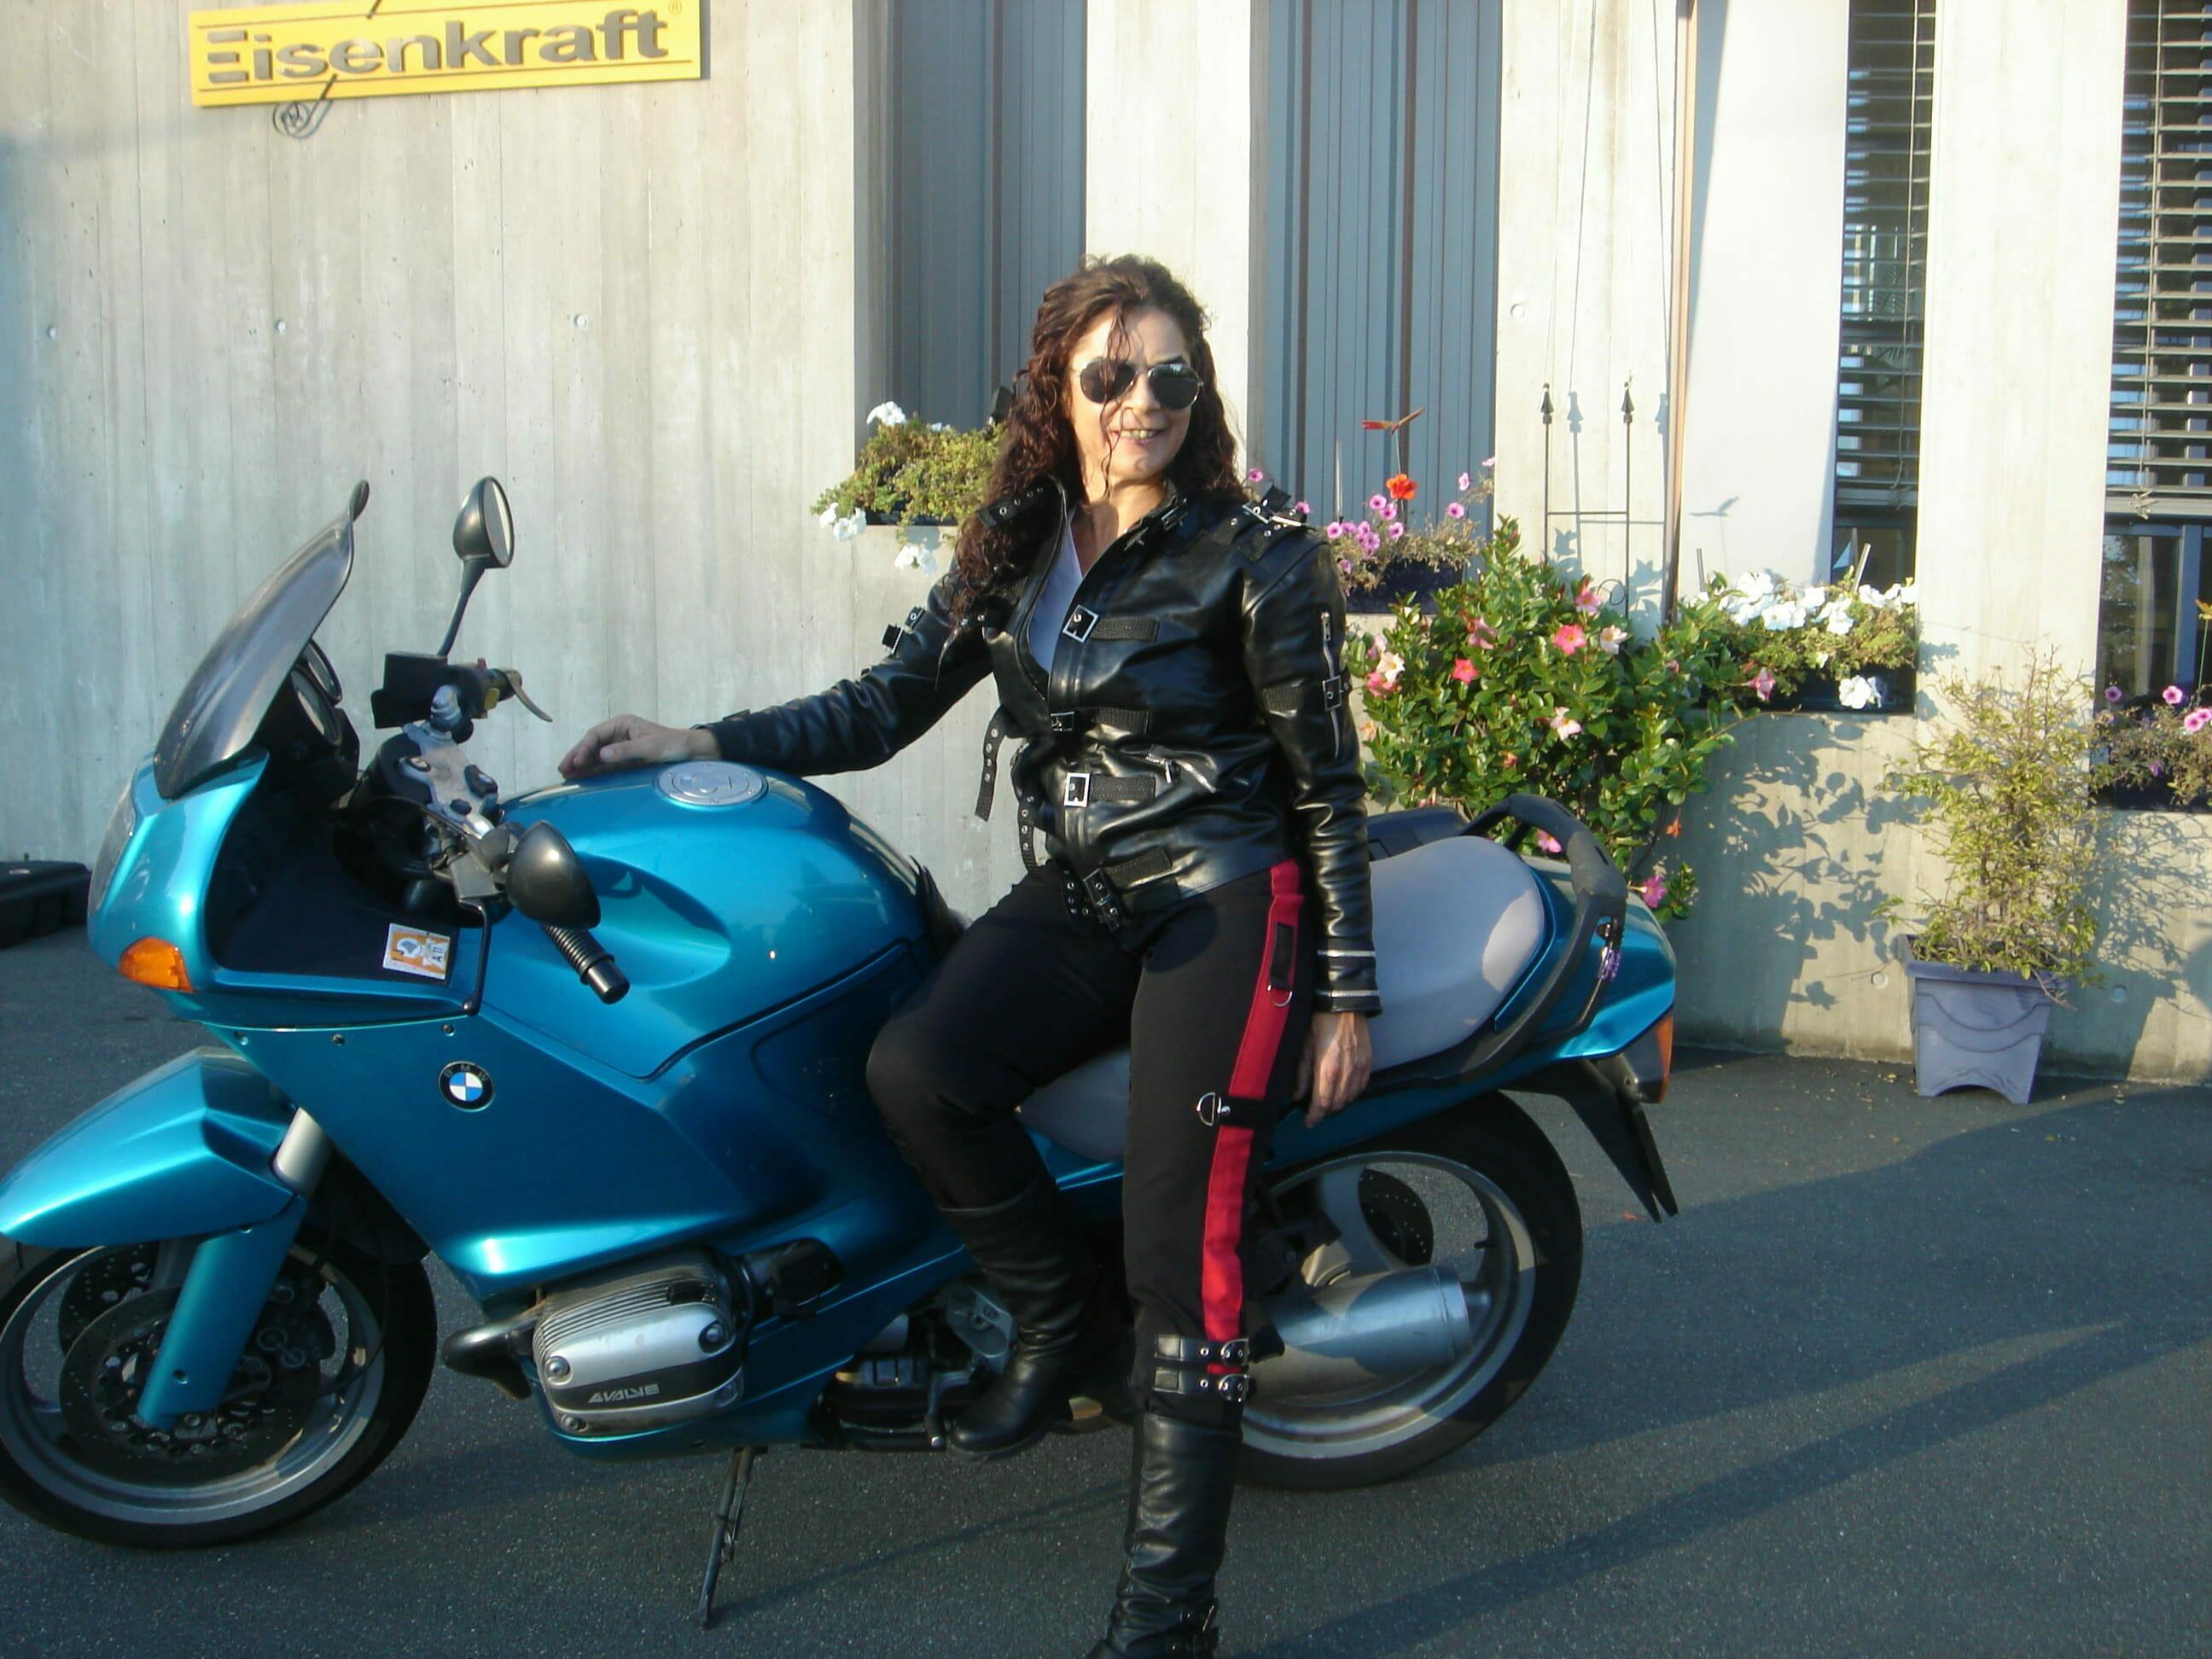 michael-jackson-BAD-leather-jacket/BMW008.jpg